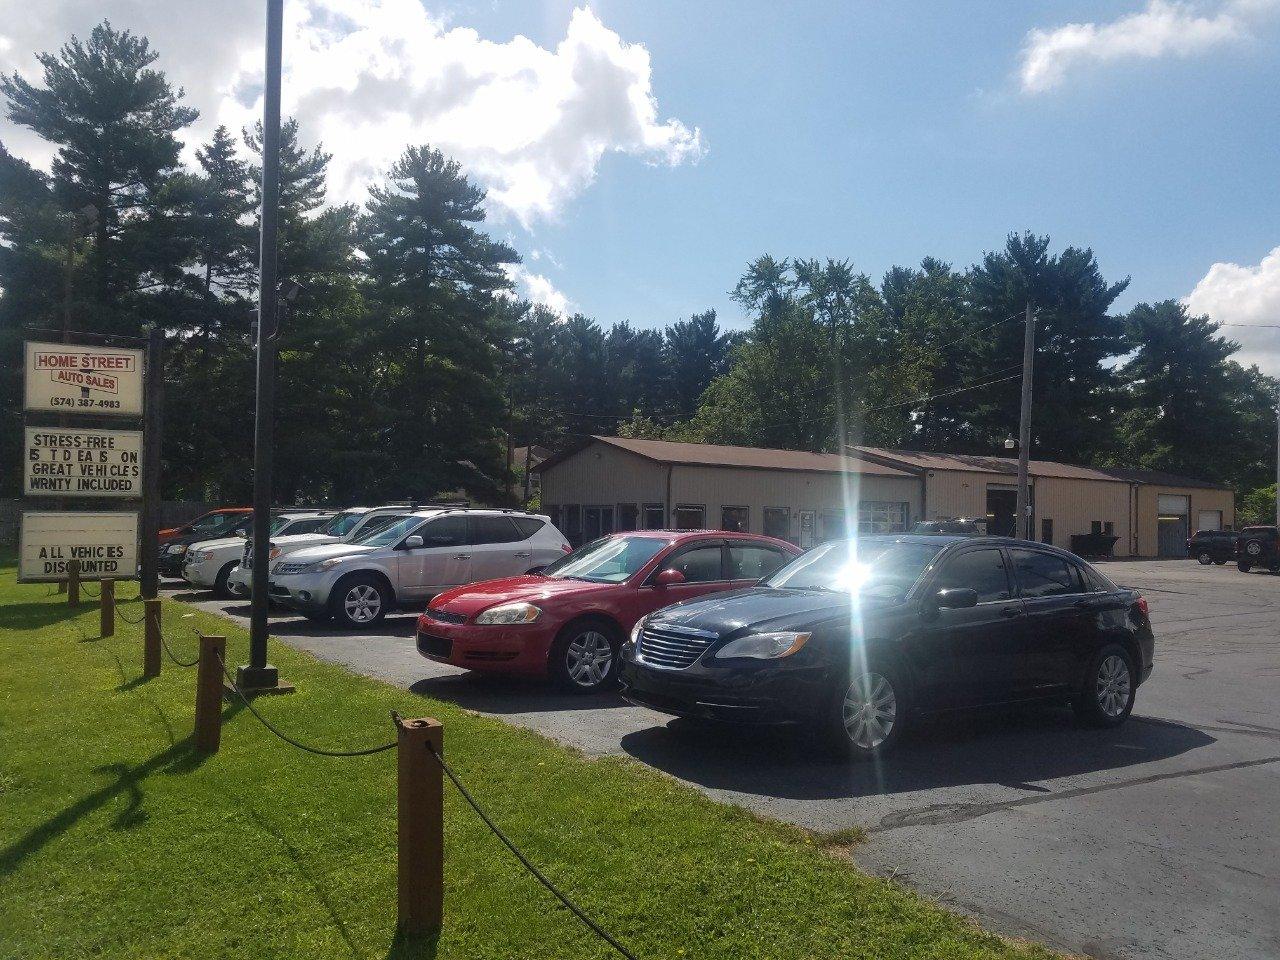 Home Street Auto Sales